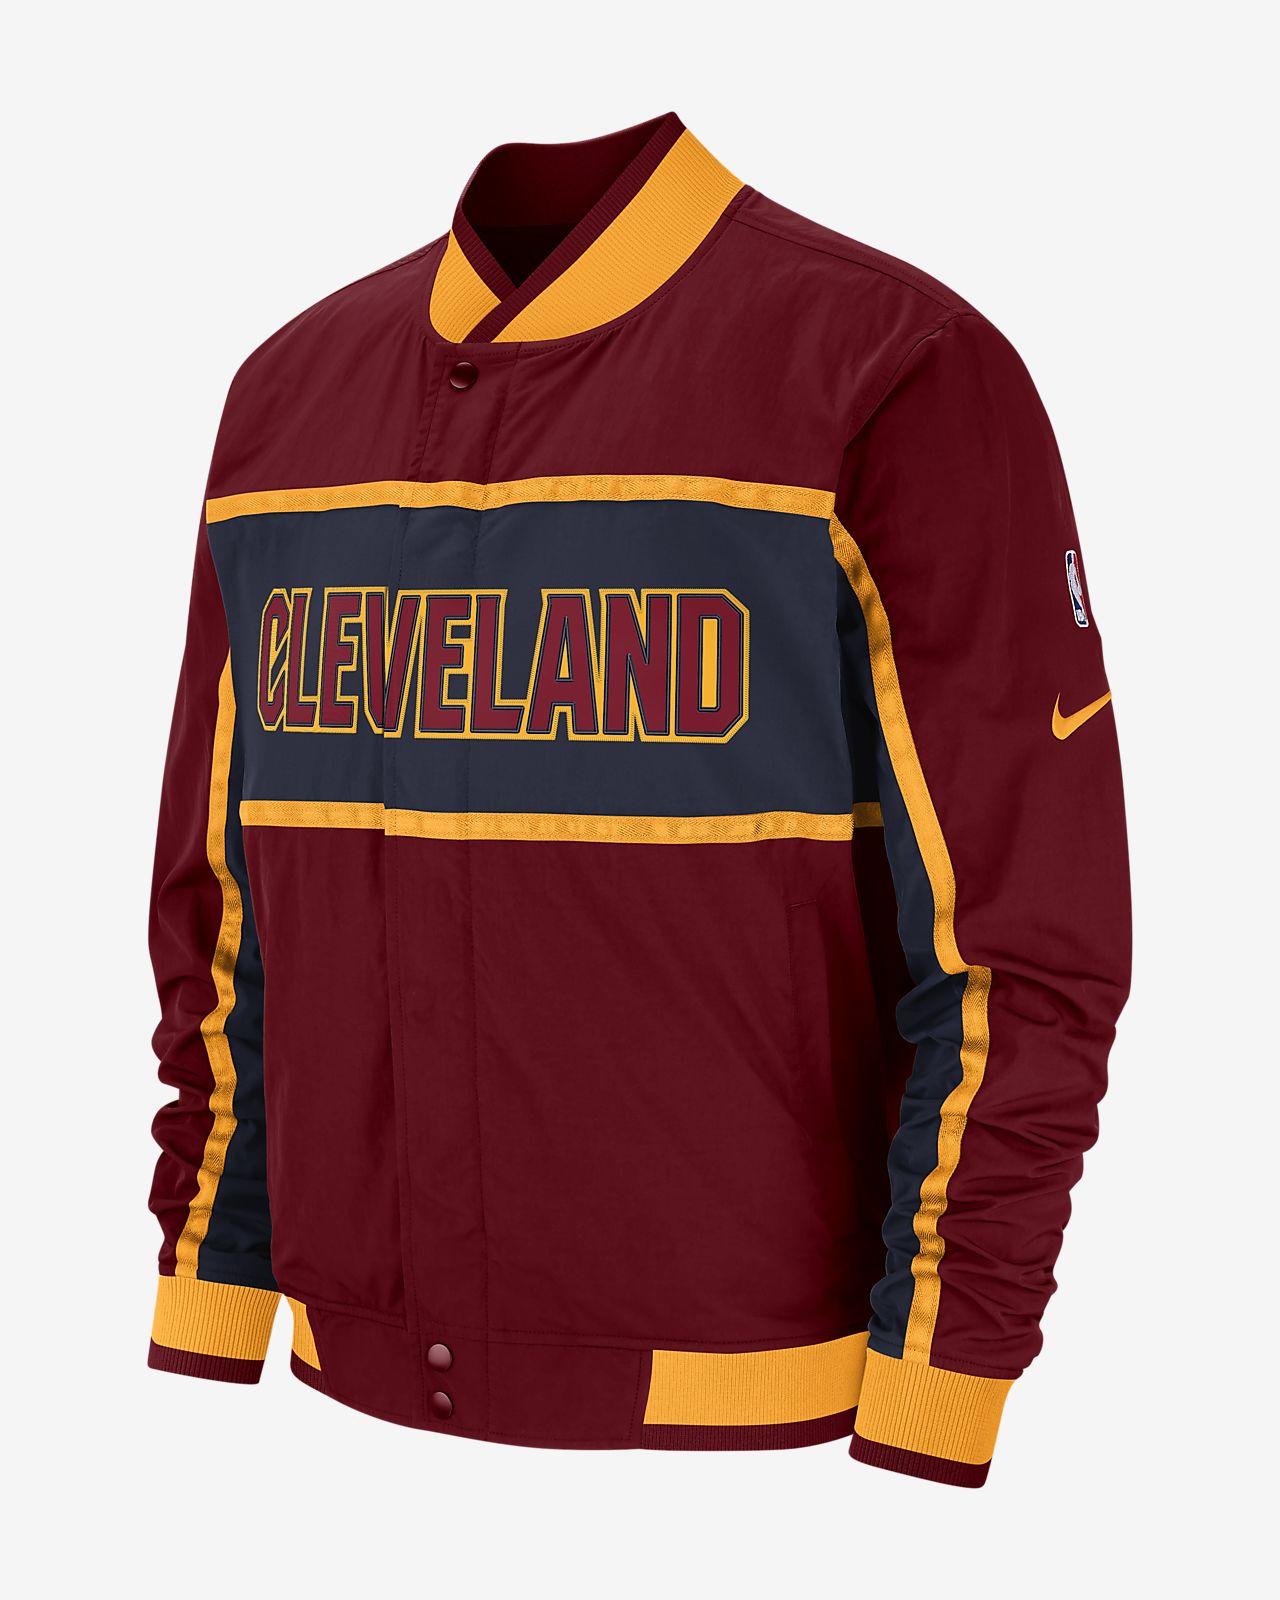 Chamarra de la NBA para hombre Cleveland Cavaliers Nike Courtside ... 46acfa7106b